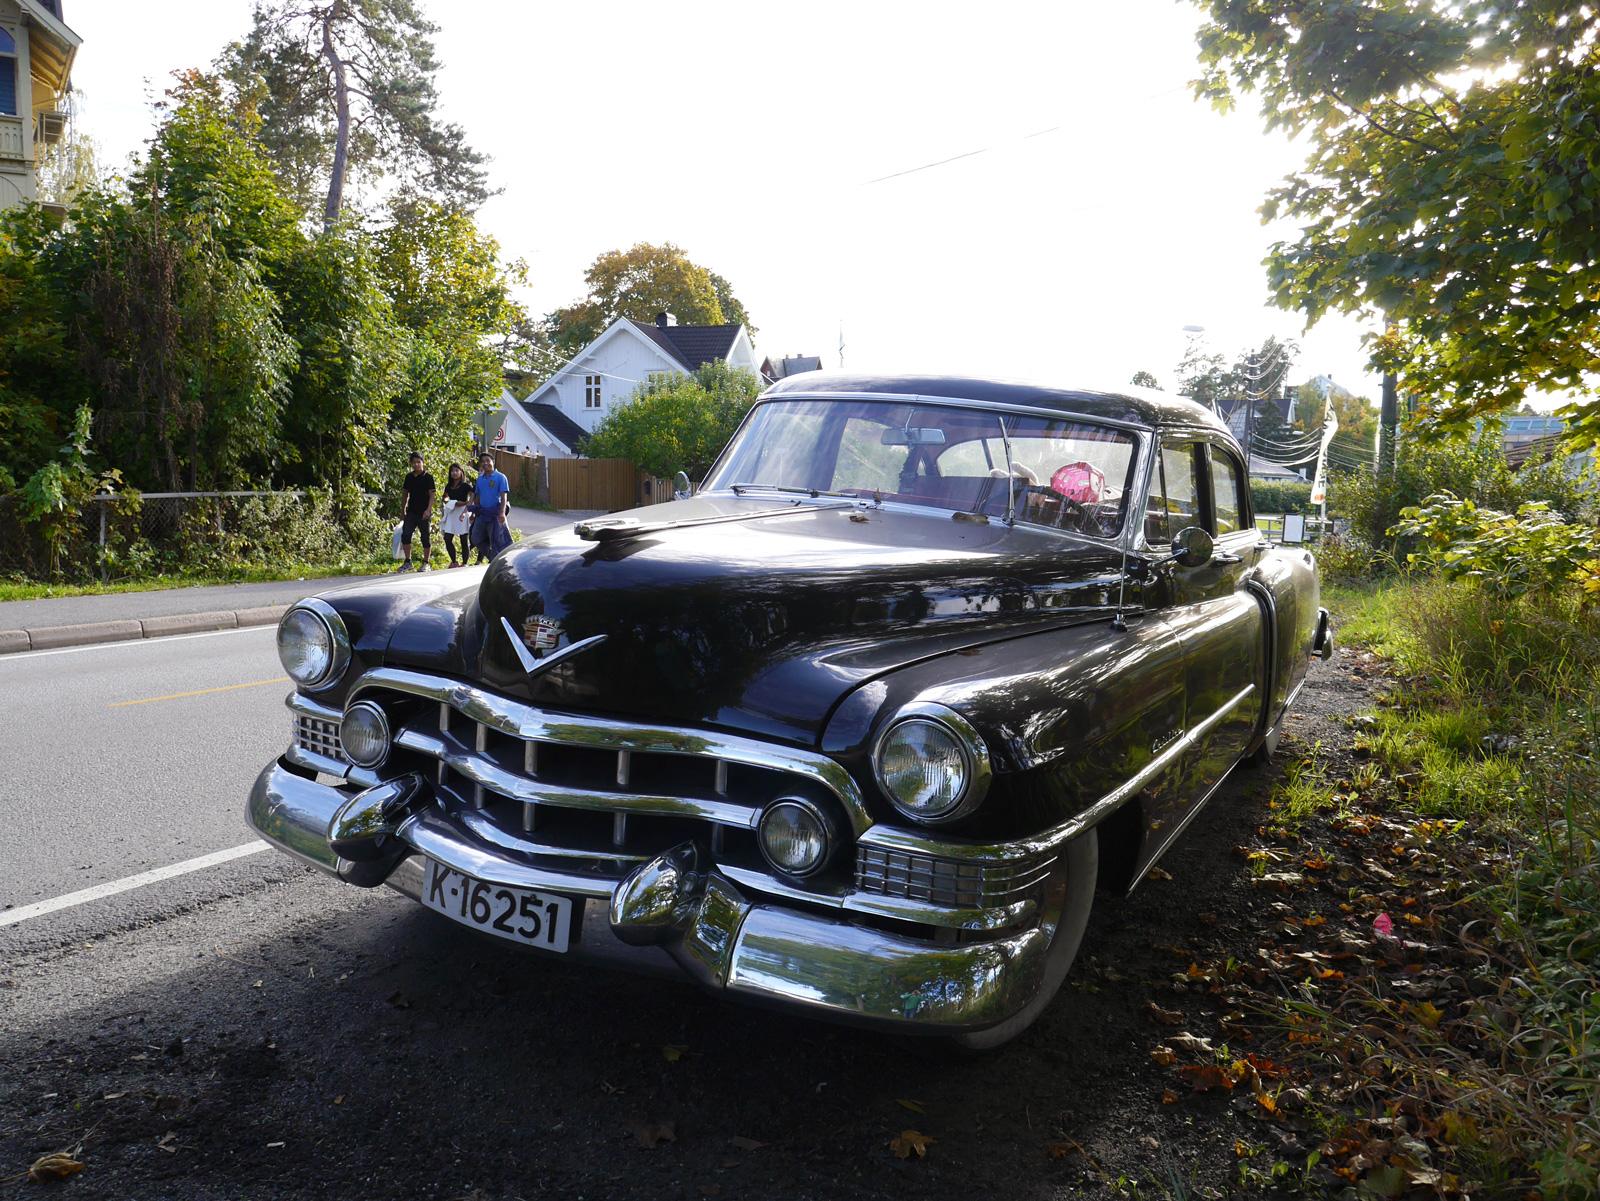 1951 Cadillac Series 62 Sedan Haryley Earl classic car Oslo Norway